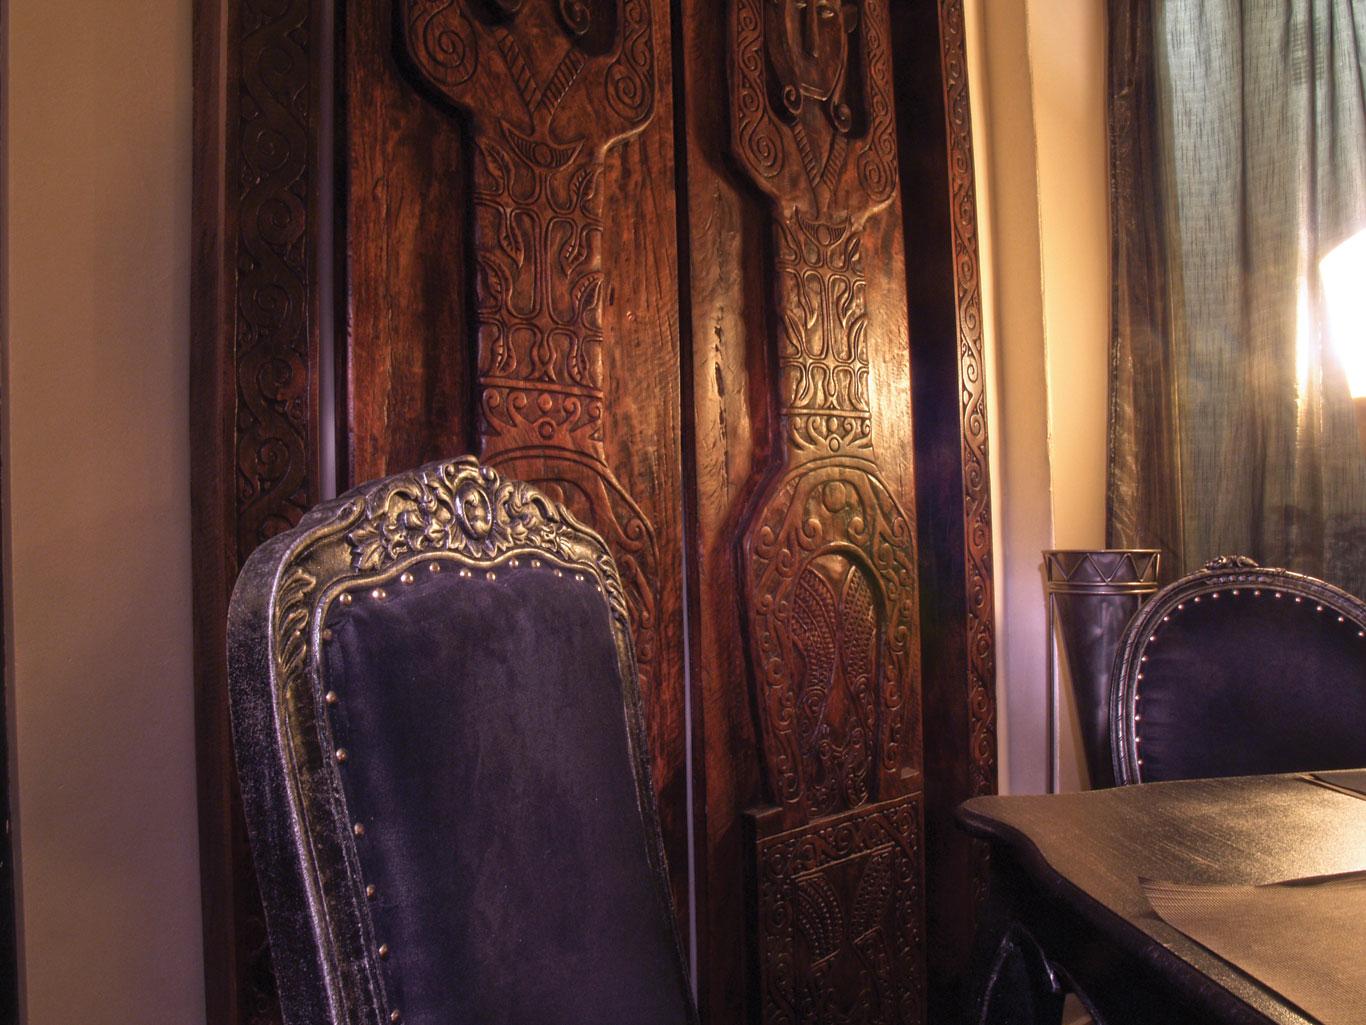 18-le-boudoir-restaurant-gros-plan-chaise-table-Perpignan